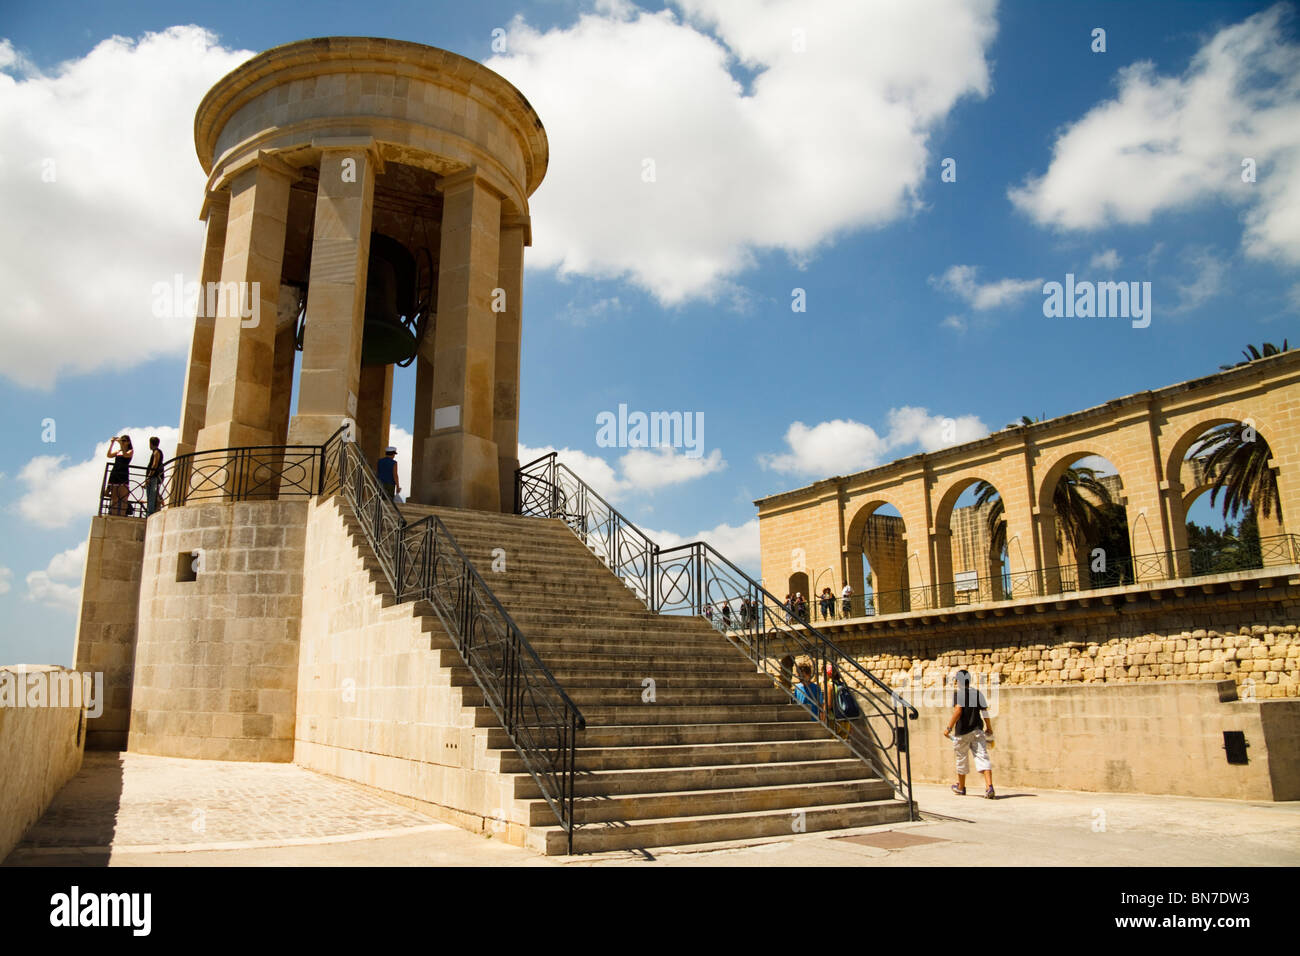 Siege Bell Monument, Valletta, Malta - Stock Image